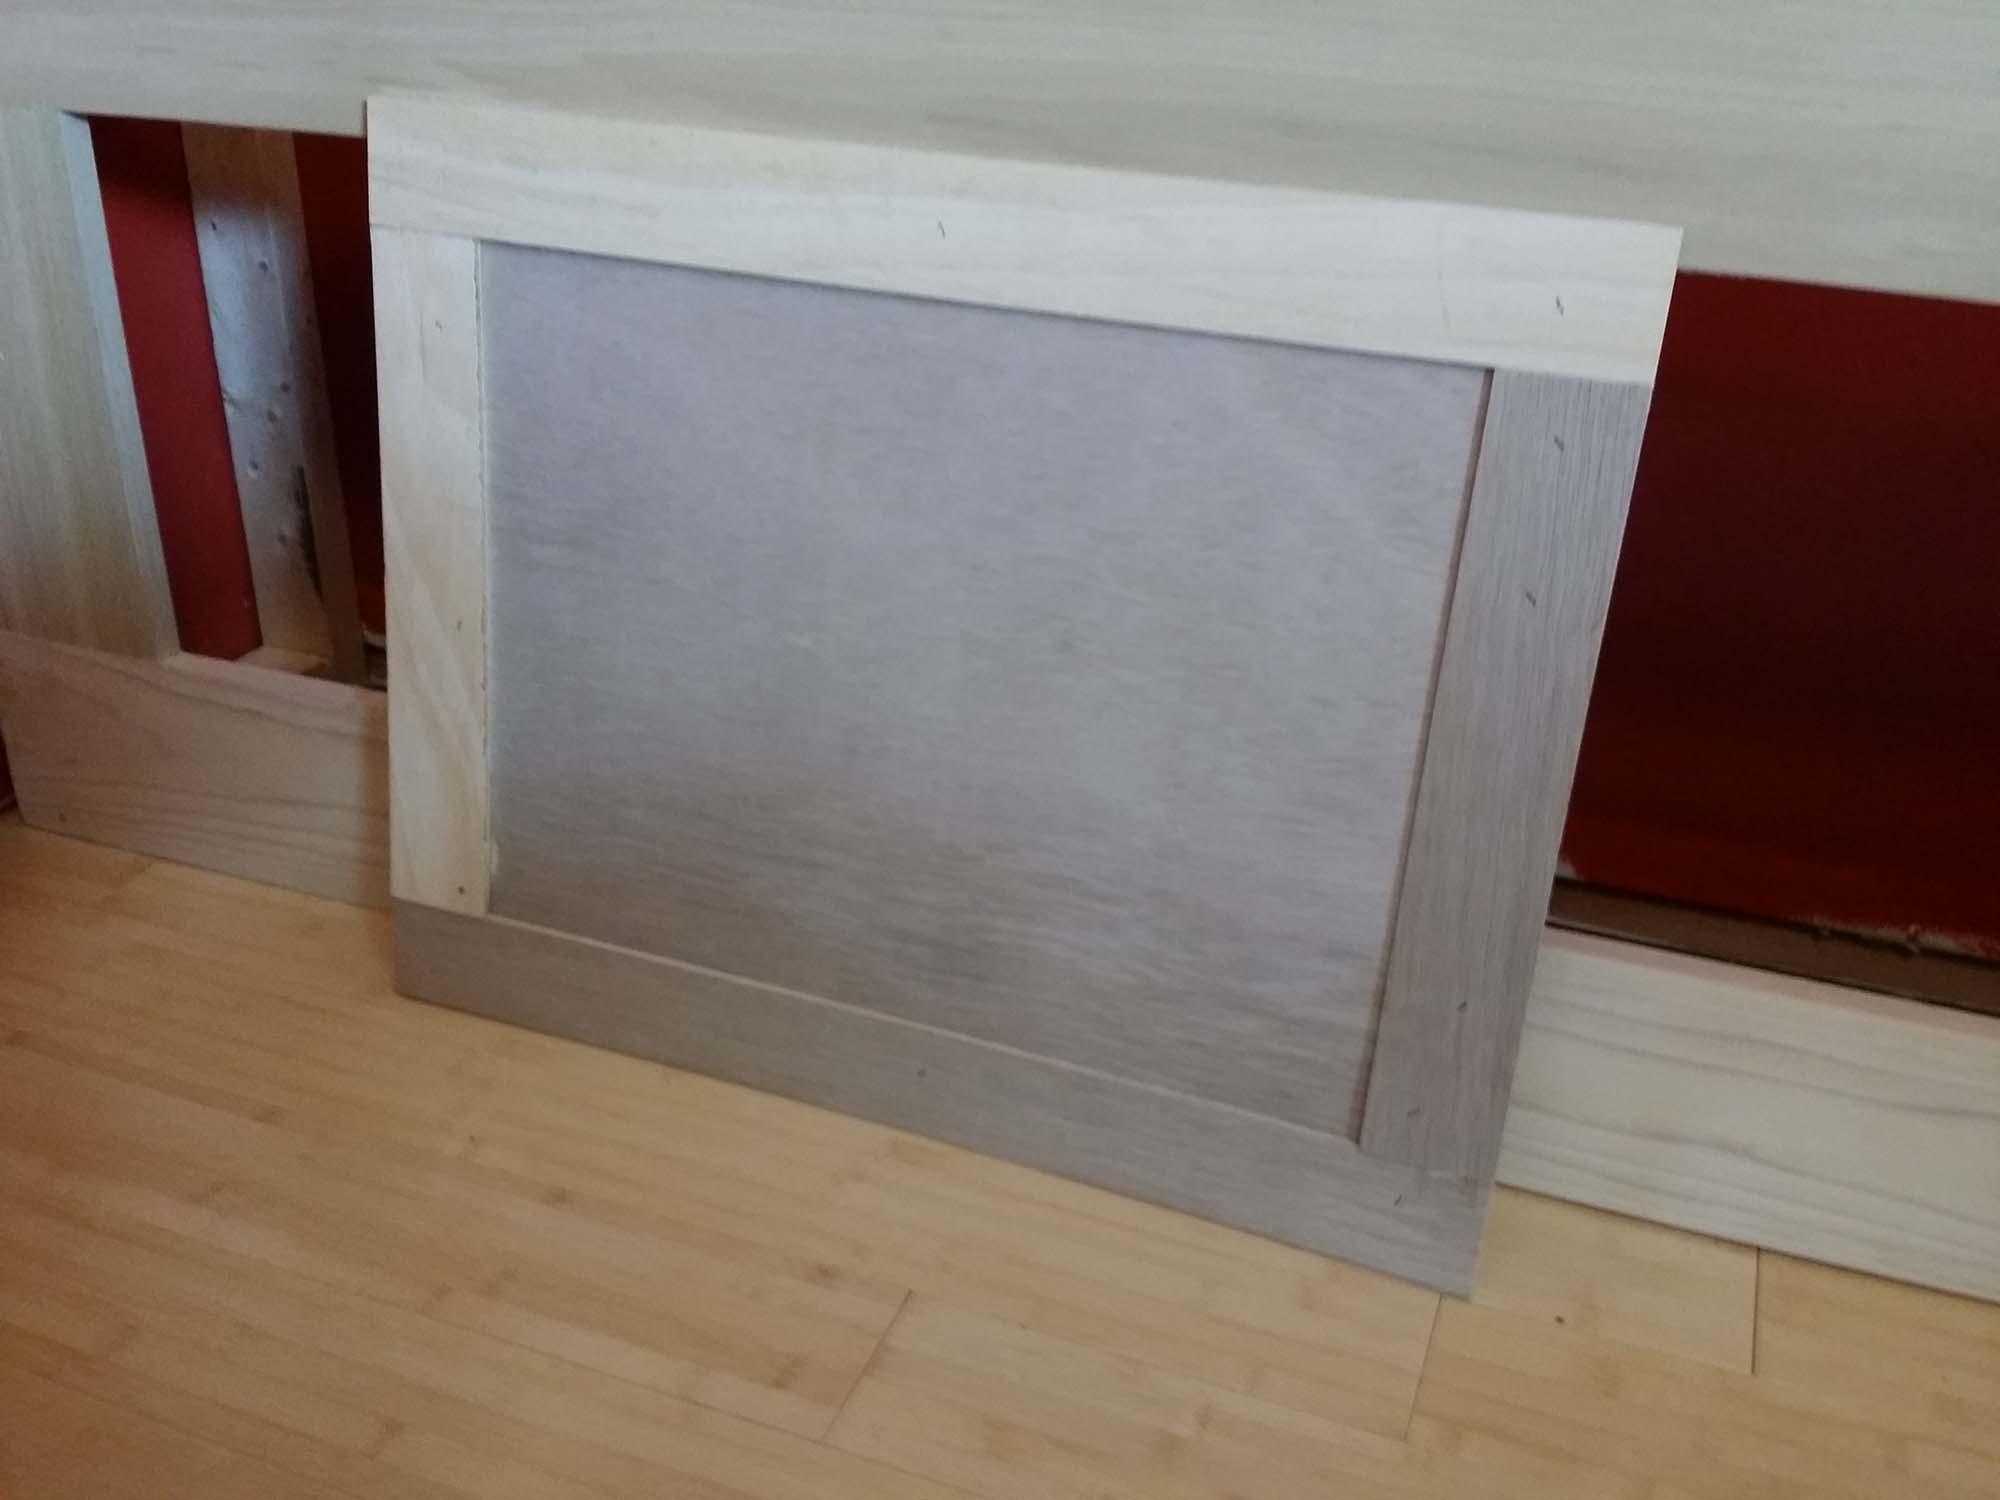 Diy Cheap Built In Library Cabinets Bookshelves 3 Finishing